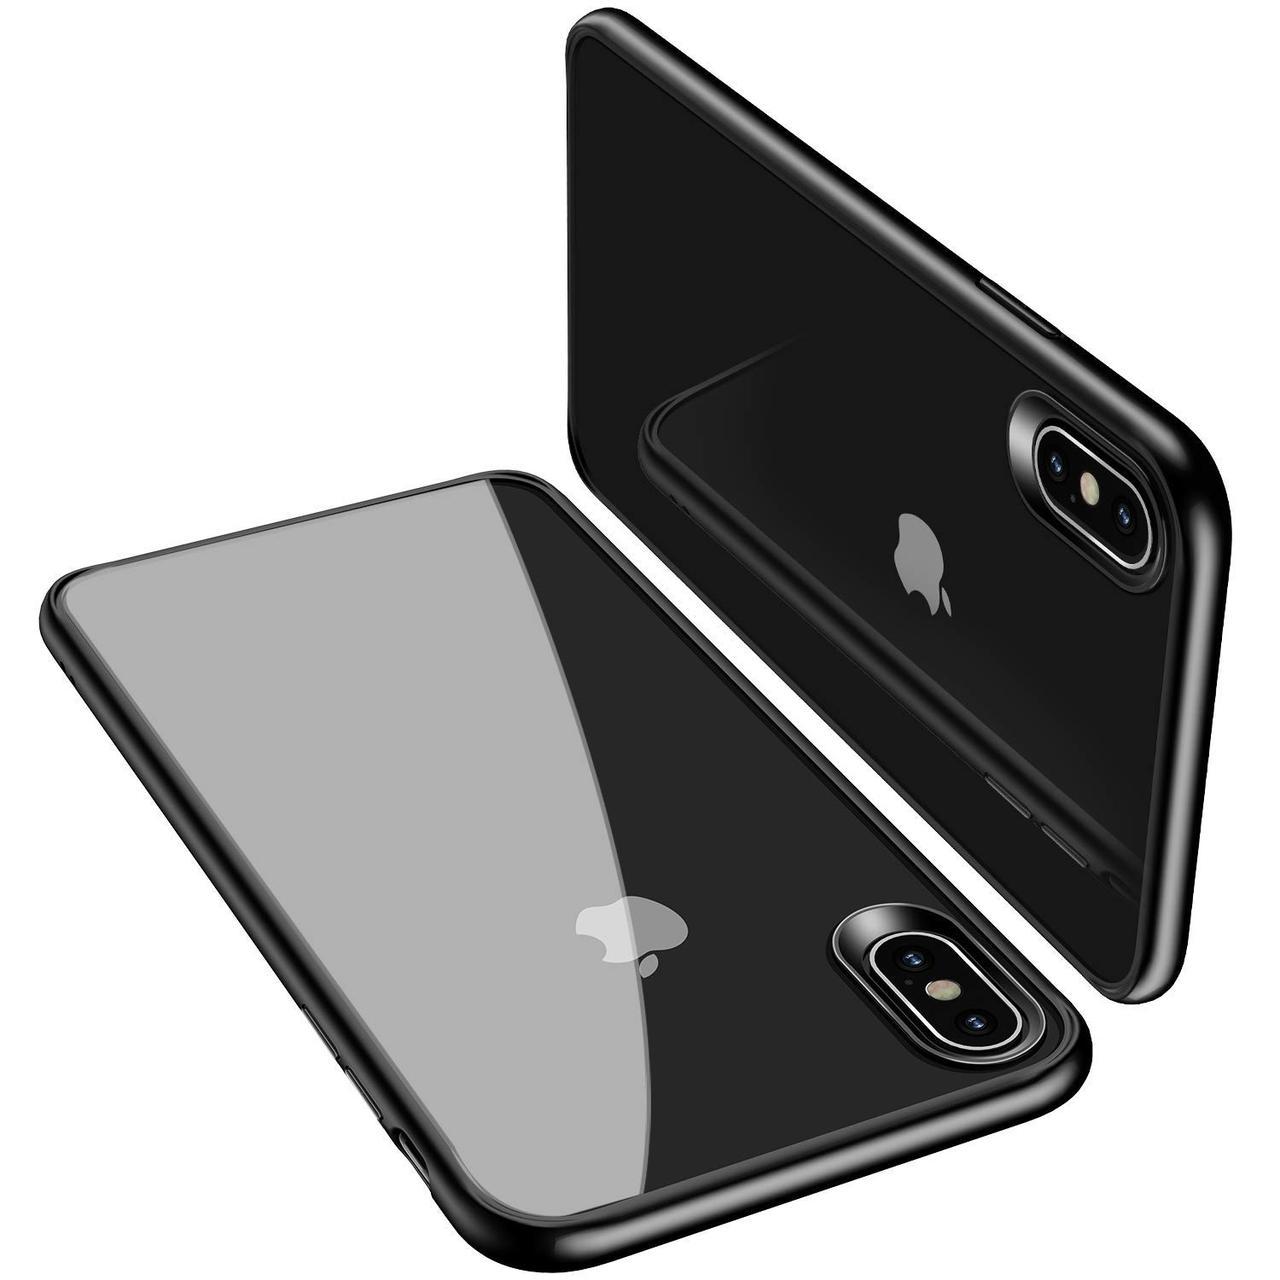 Чехол накладка USAMS для Apple iPhone X / XS Mant series Черный / Прозрачный (IP18MD01)